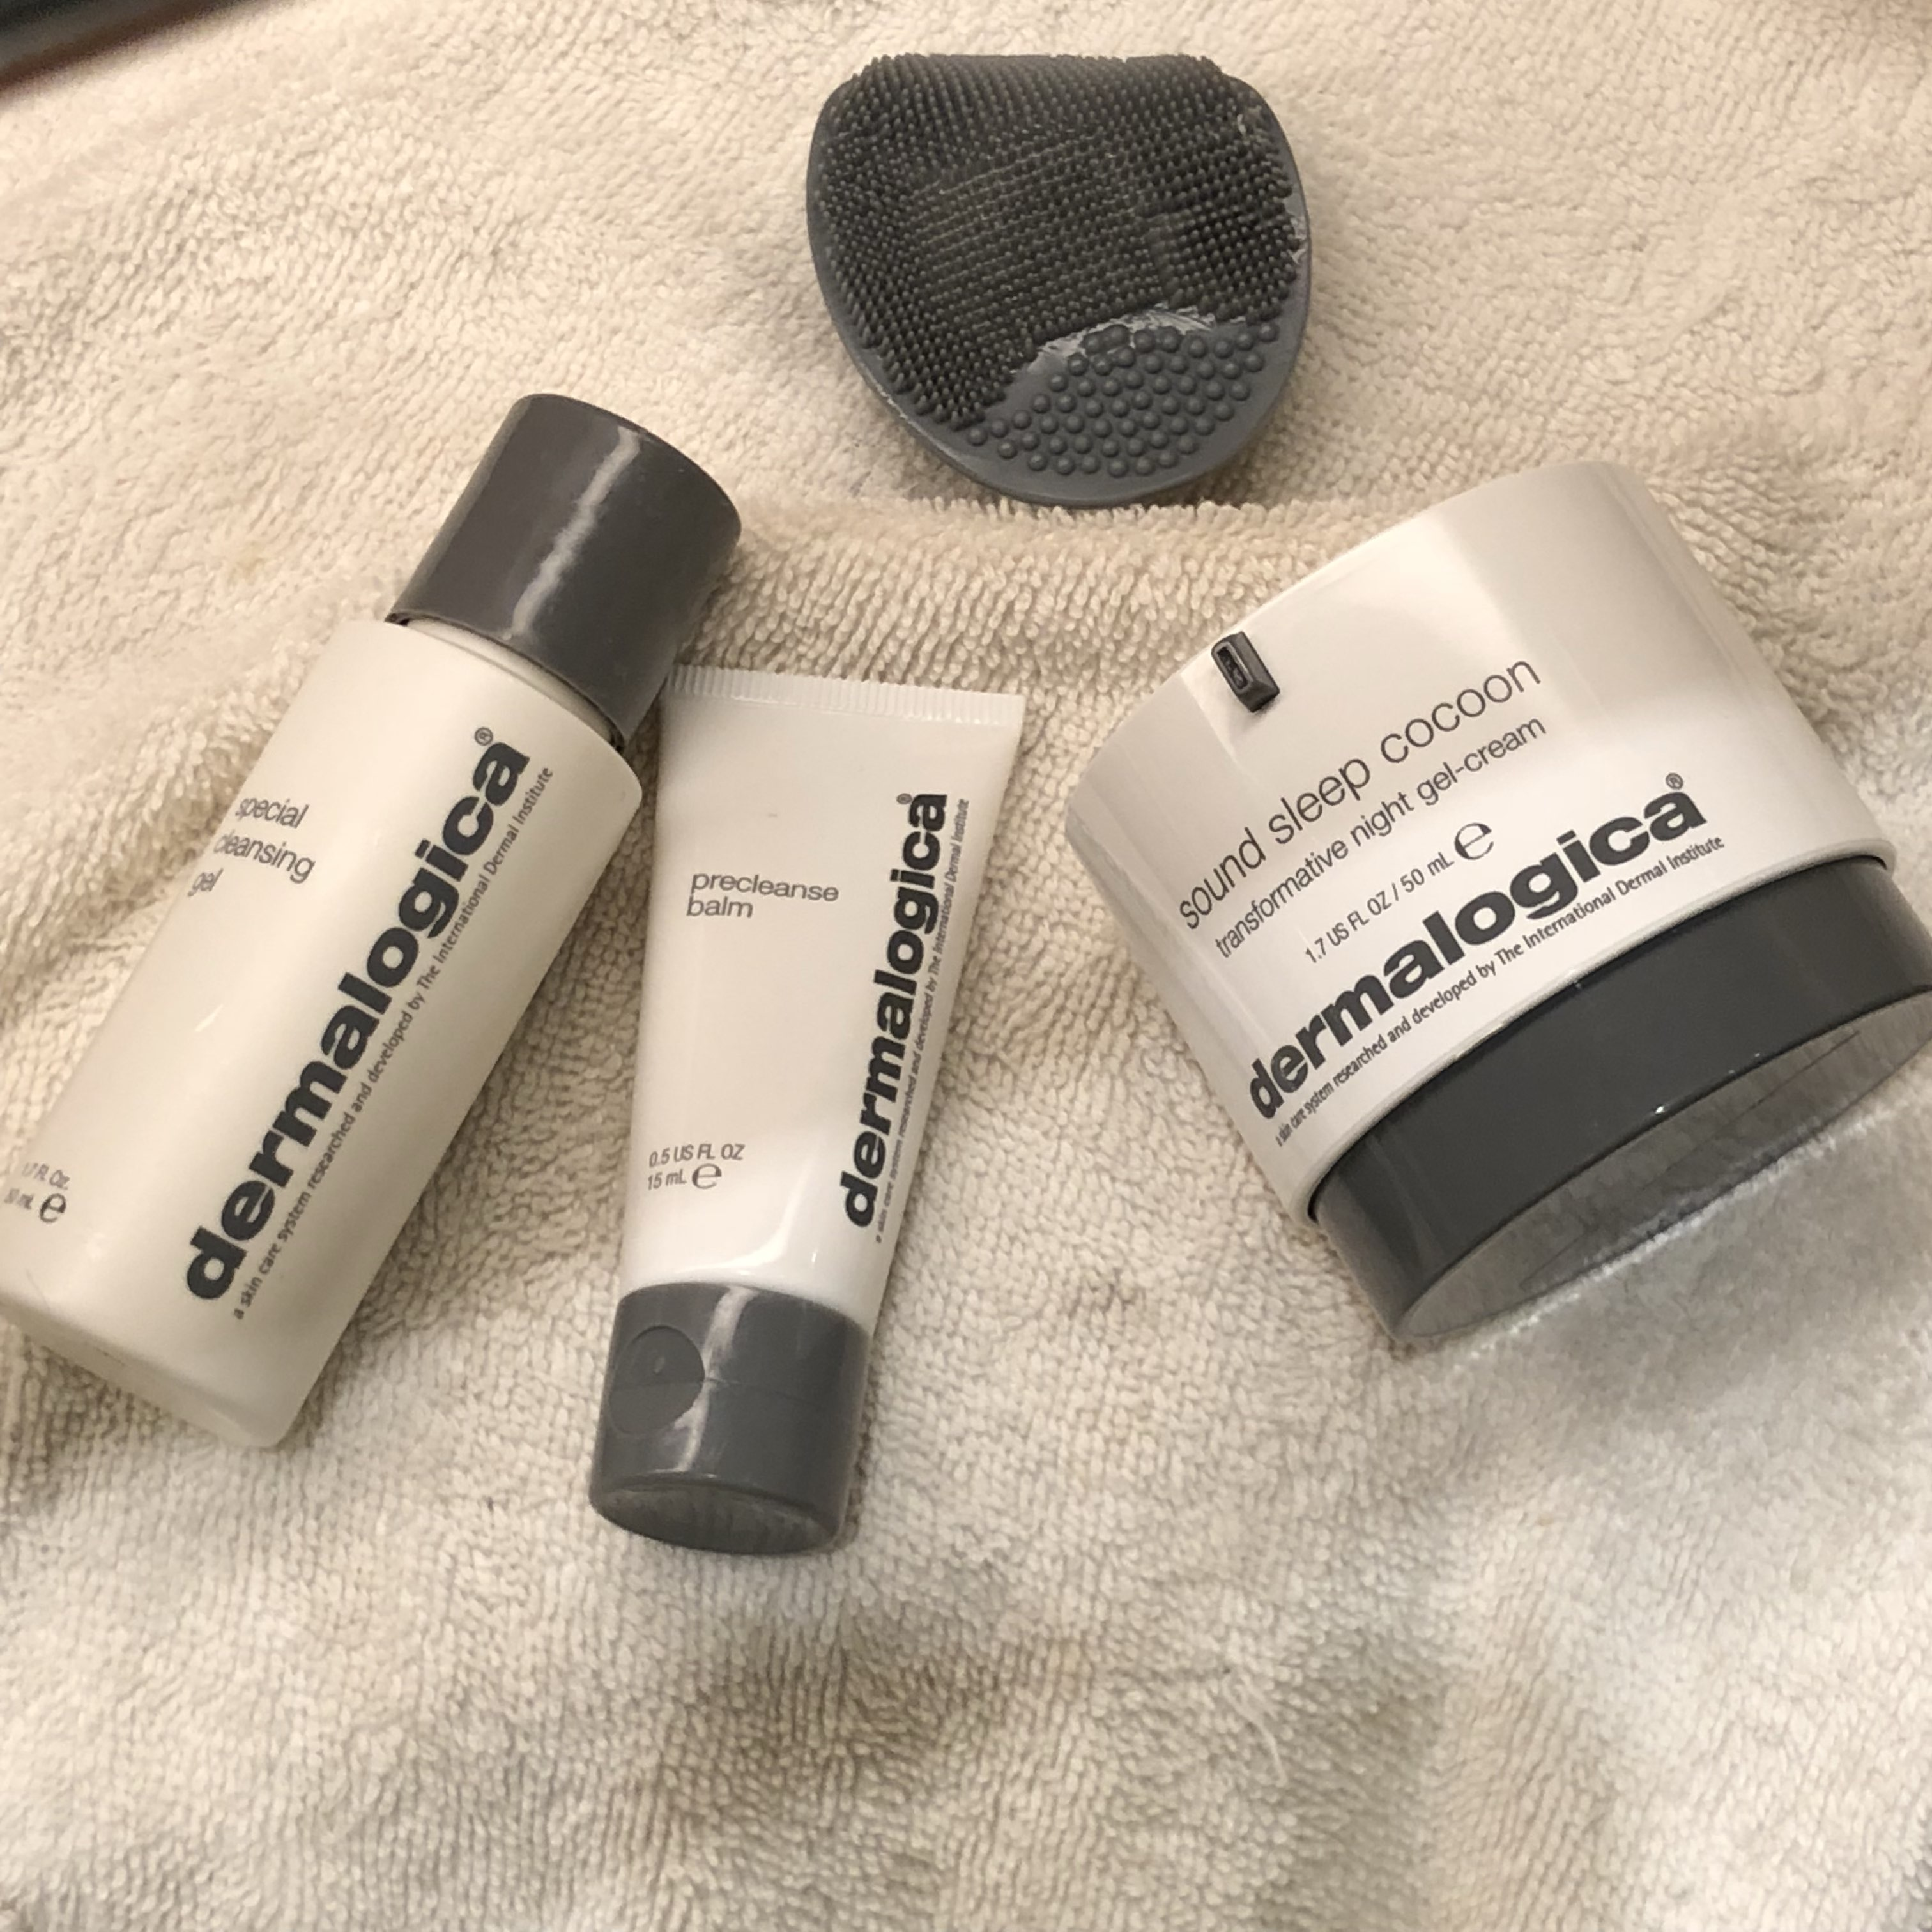 [SKIN] dermalogica 晚間肌膚修復只需一步 Sound Sleep Cocoon